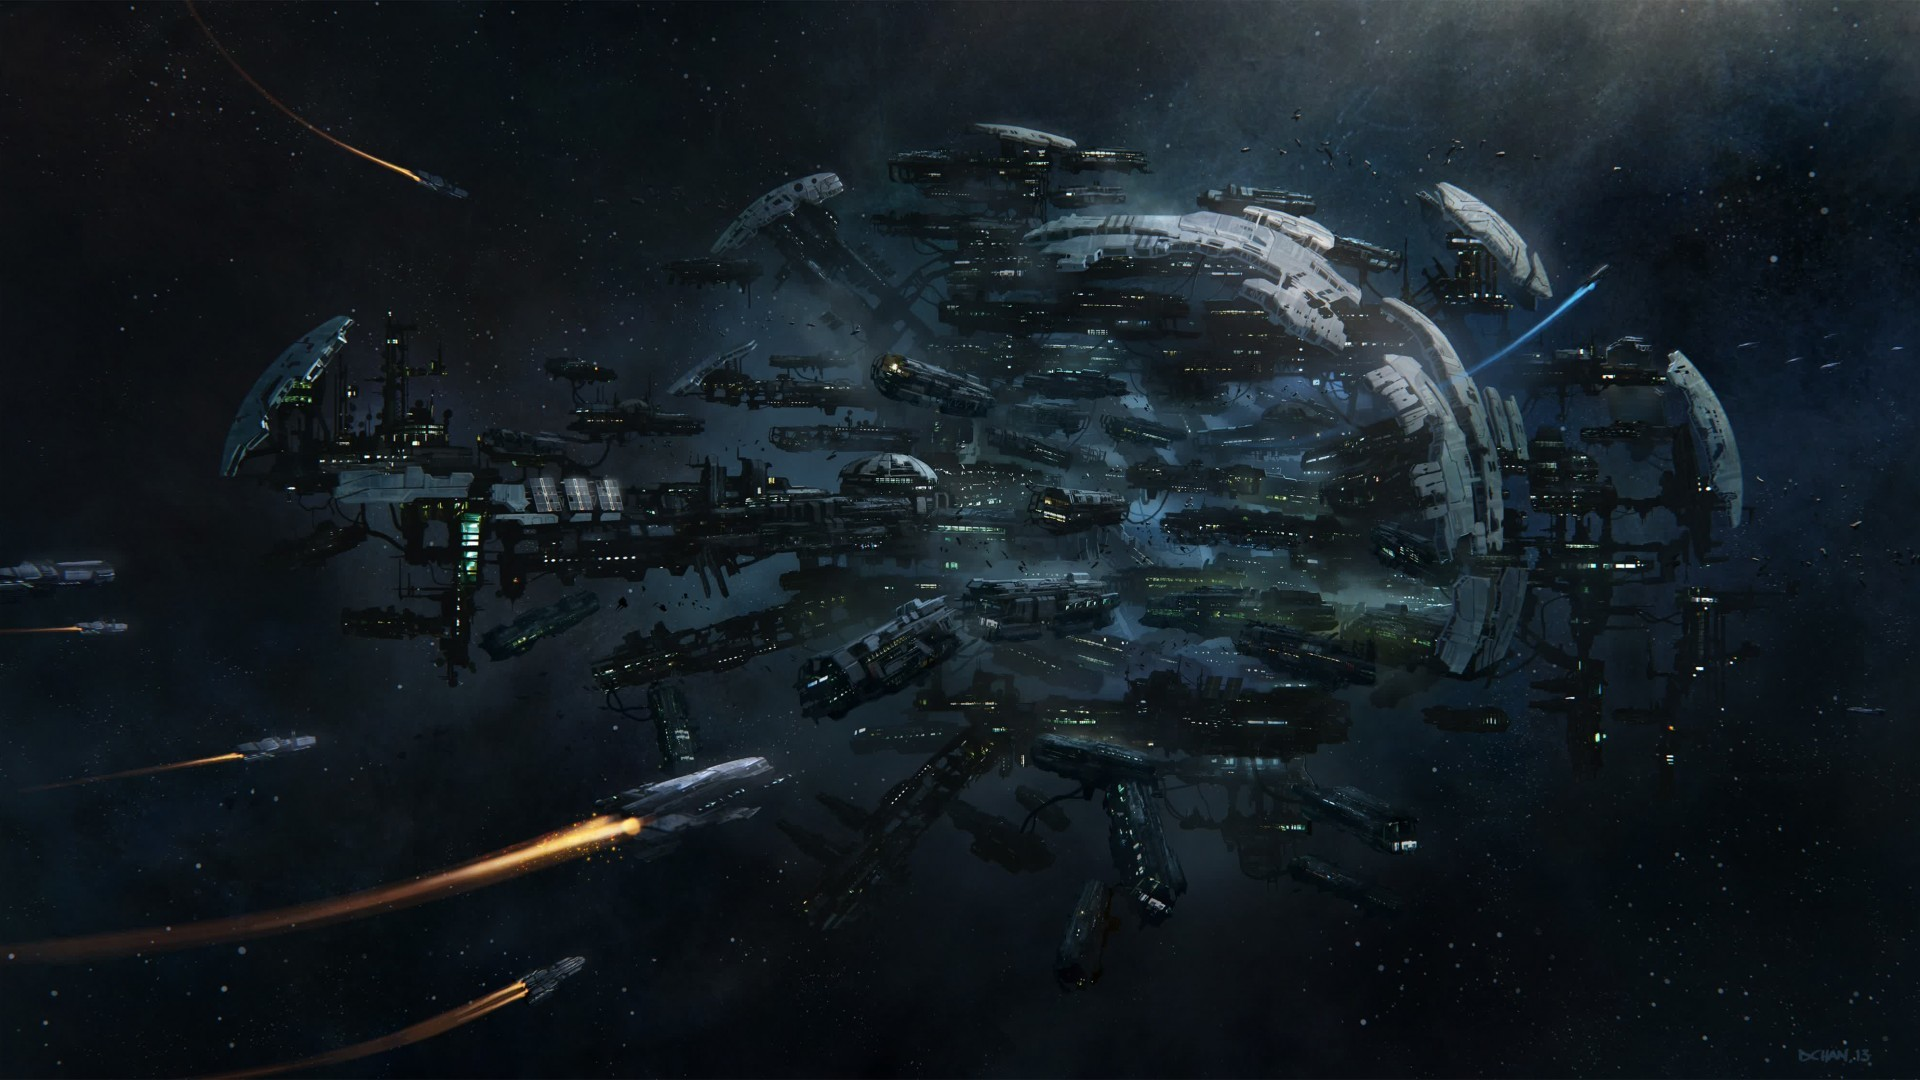 simulator, battle, sci-fi, spaceship, screenshot, 4k .